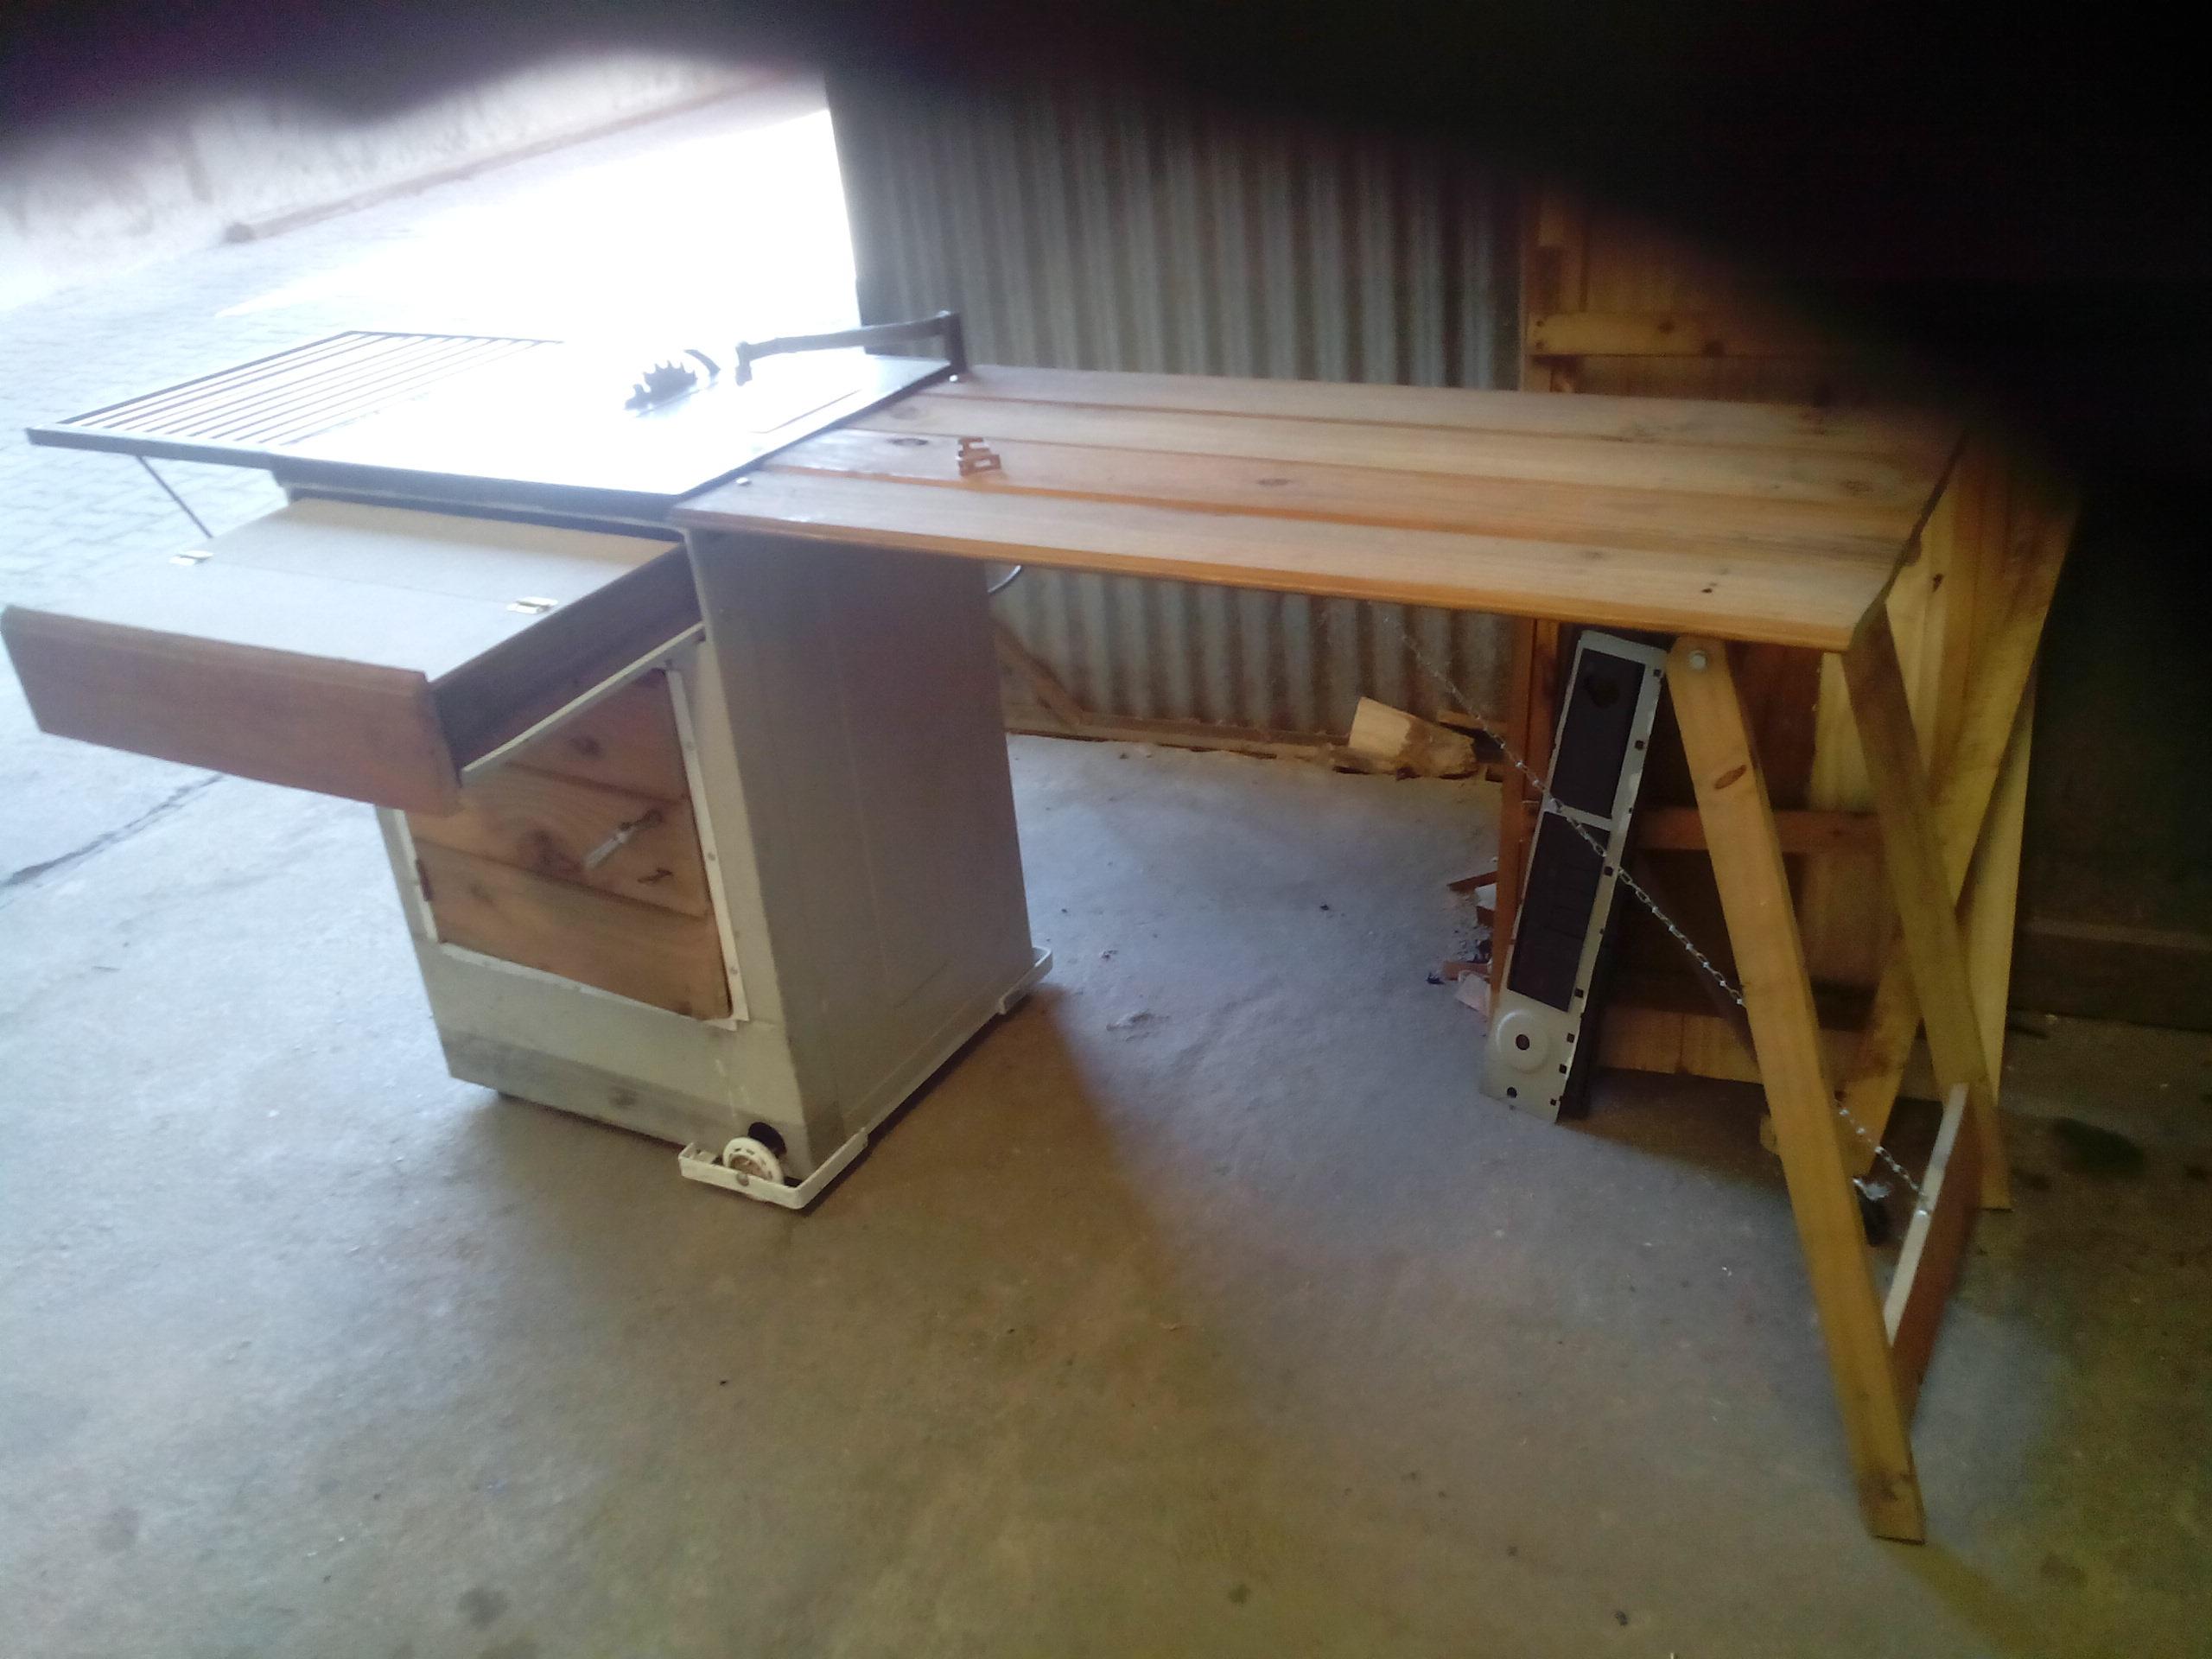 Multi-function workbench